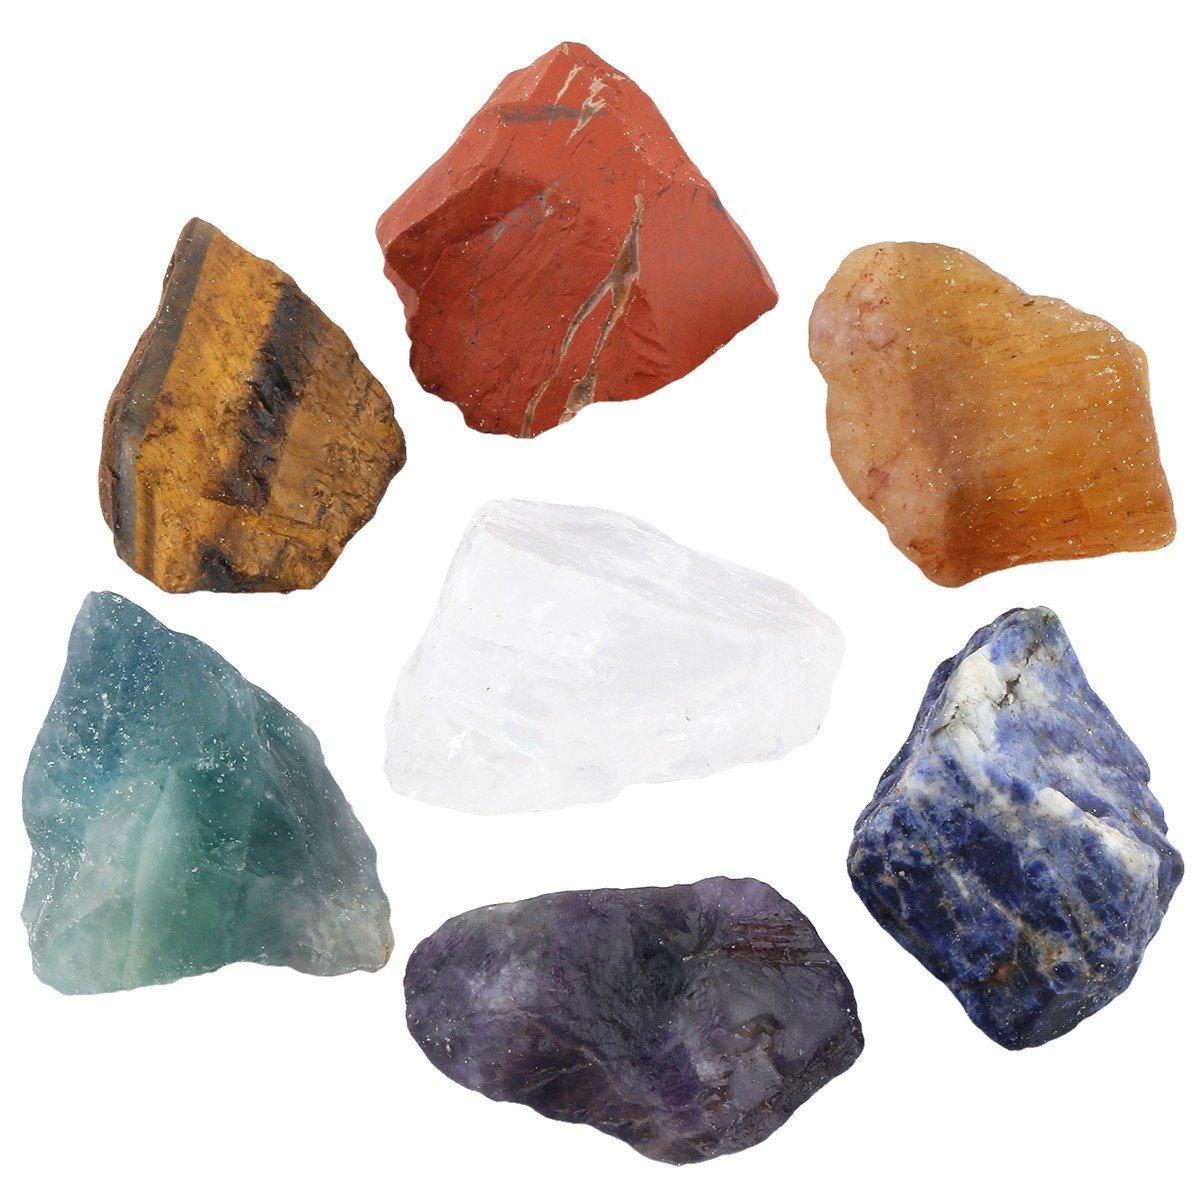 rockcloud Healing Crystal Kit,7 Chakra Stones Raw Crystals Reiki Blancing Meditation